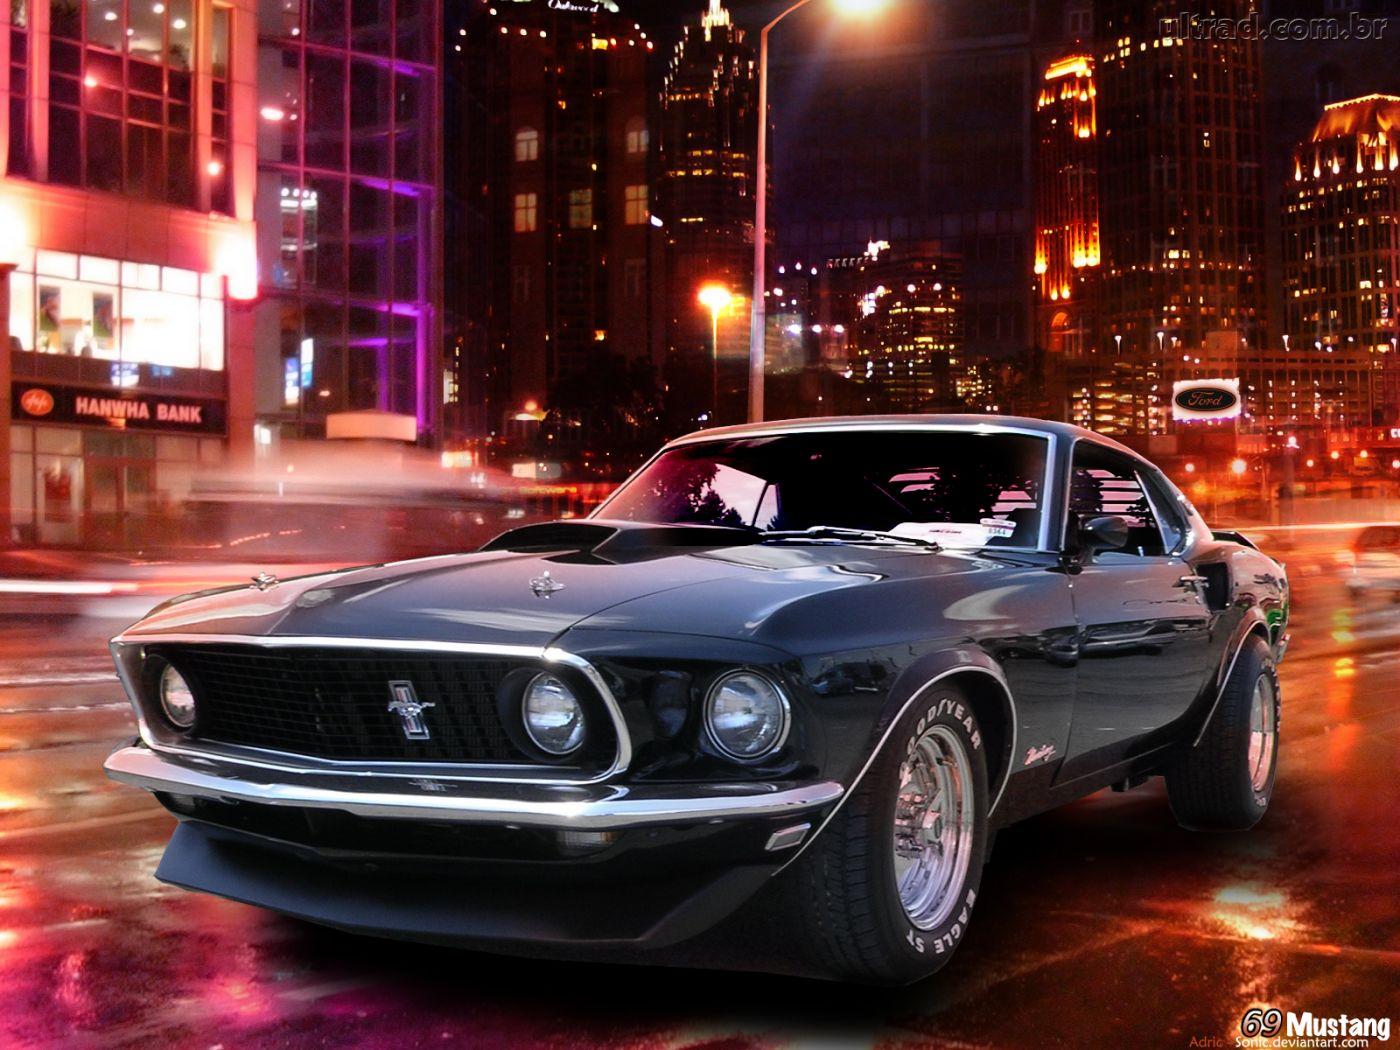 Mustang 69 1400x1050